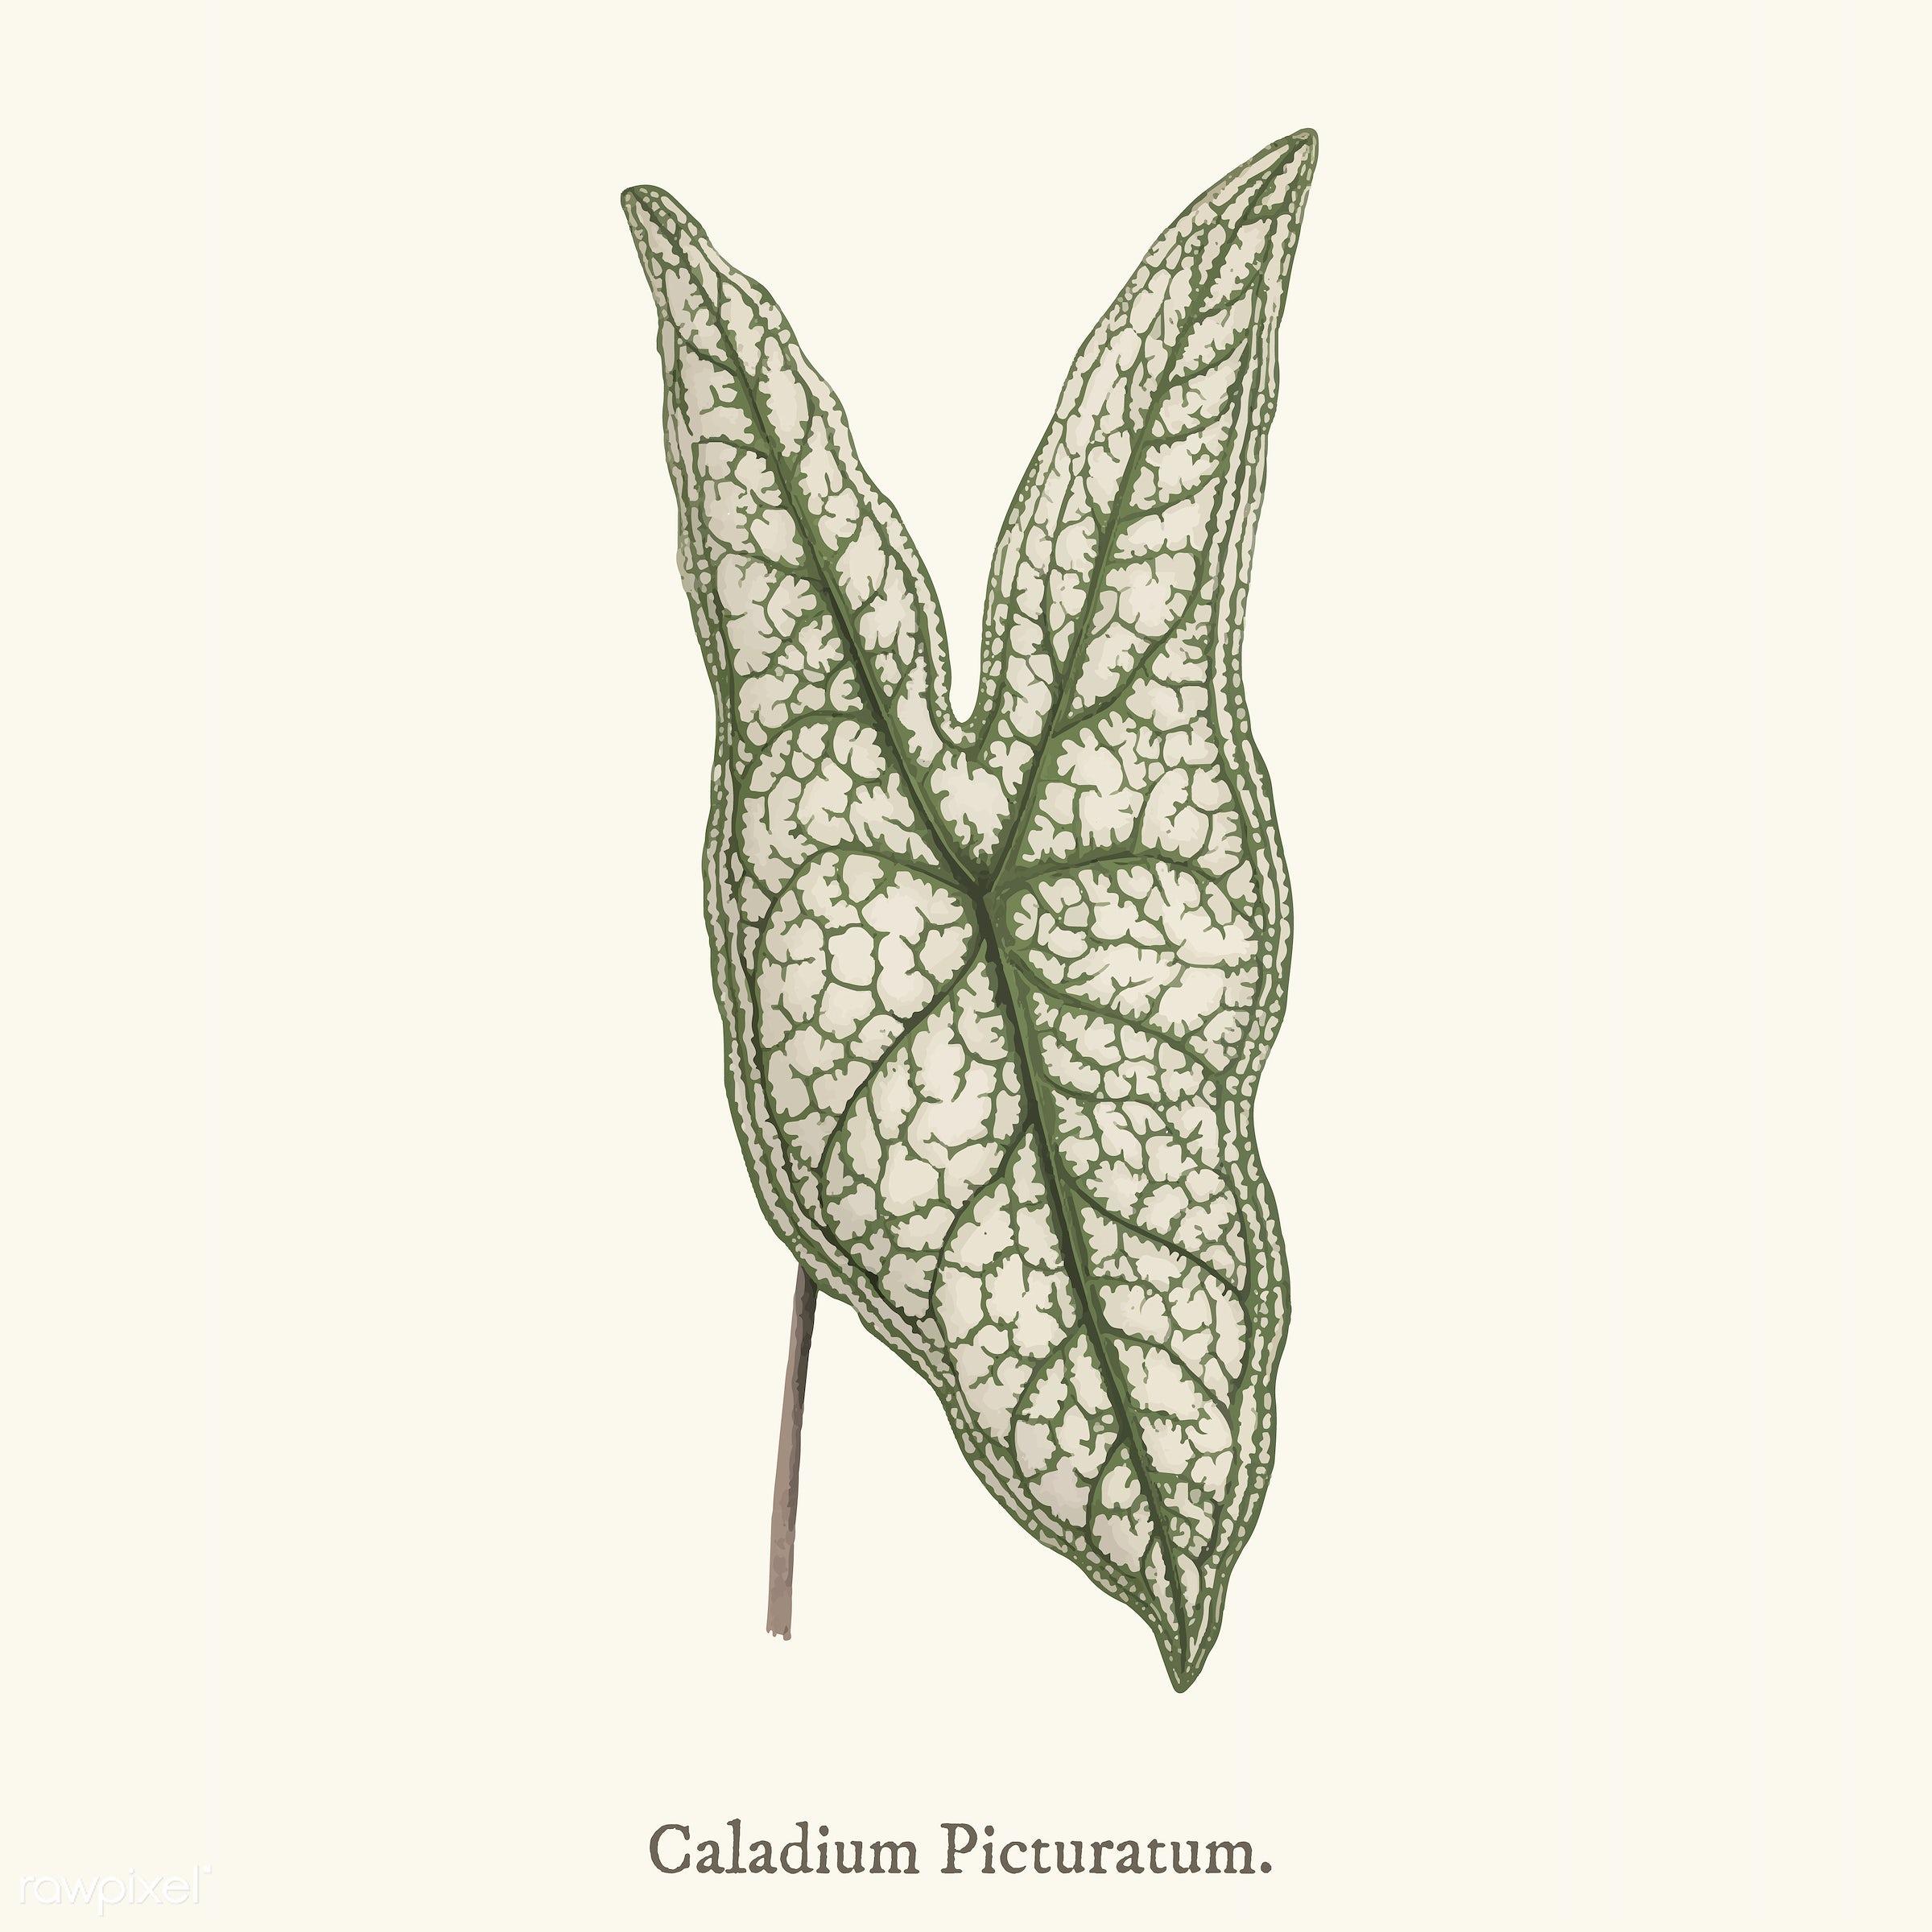 leaf, pattern, ancient, angel wings, antique, aphyllarum, belleymel, caladium, calcadium belleymel, decorate, decoration,...